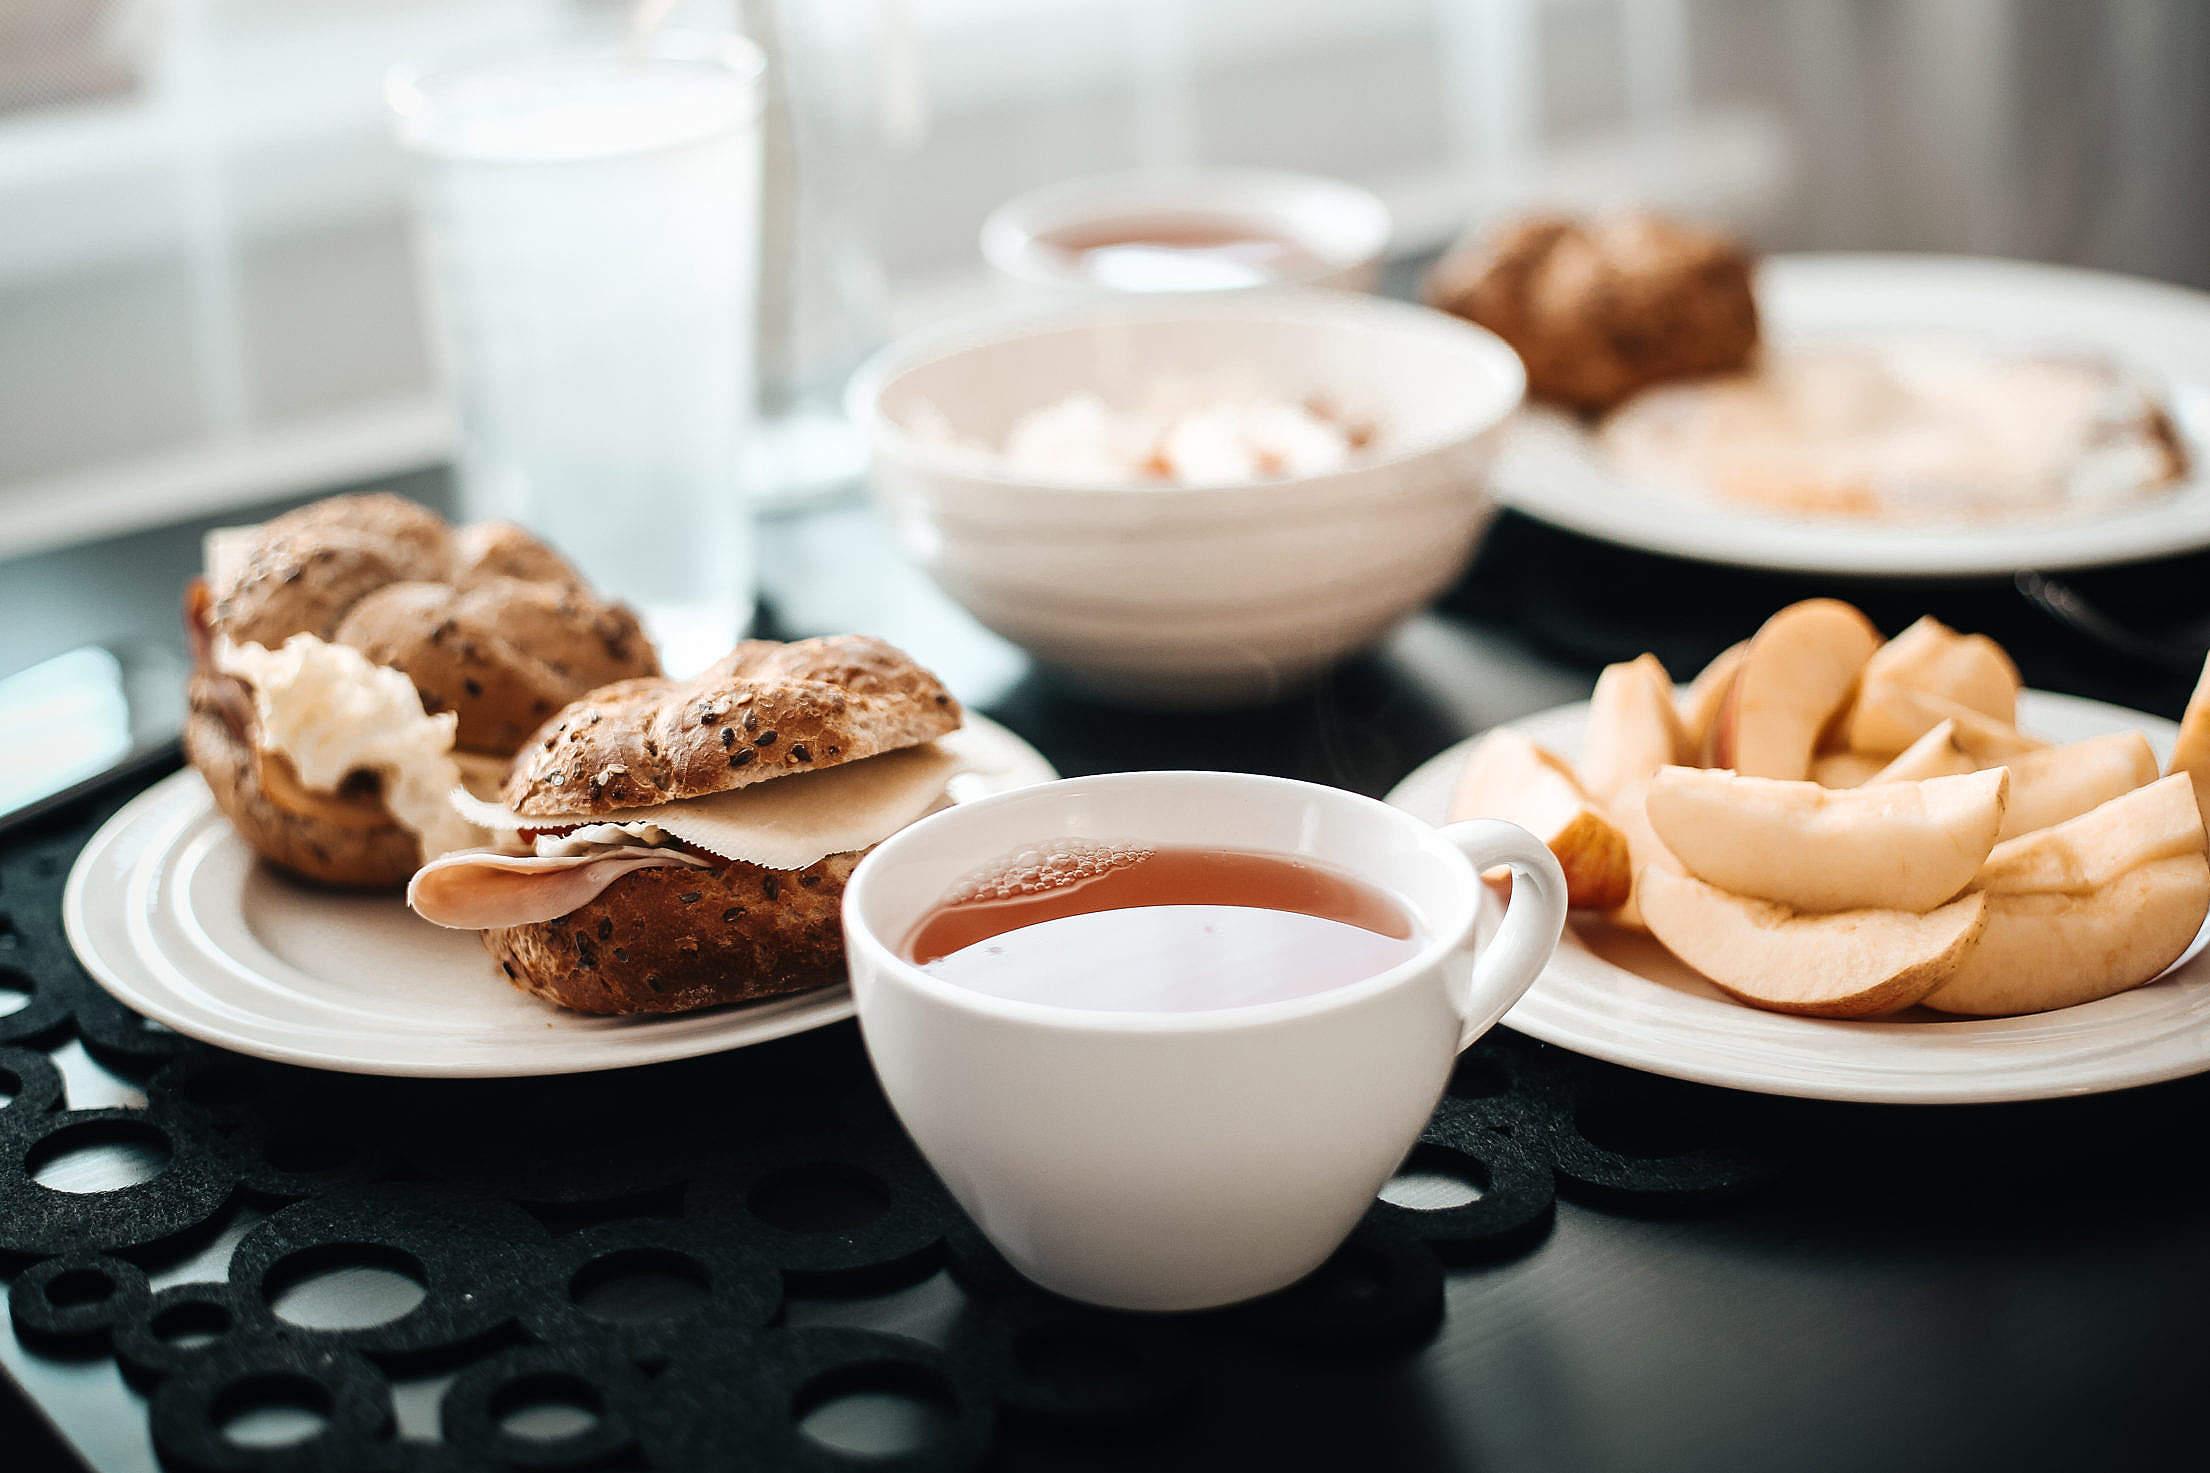 Fresh & Healthy Morning Breakfast Free Stock Photo